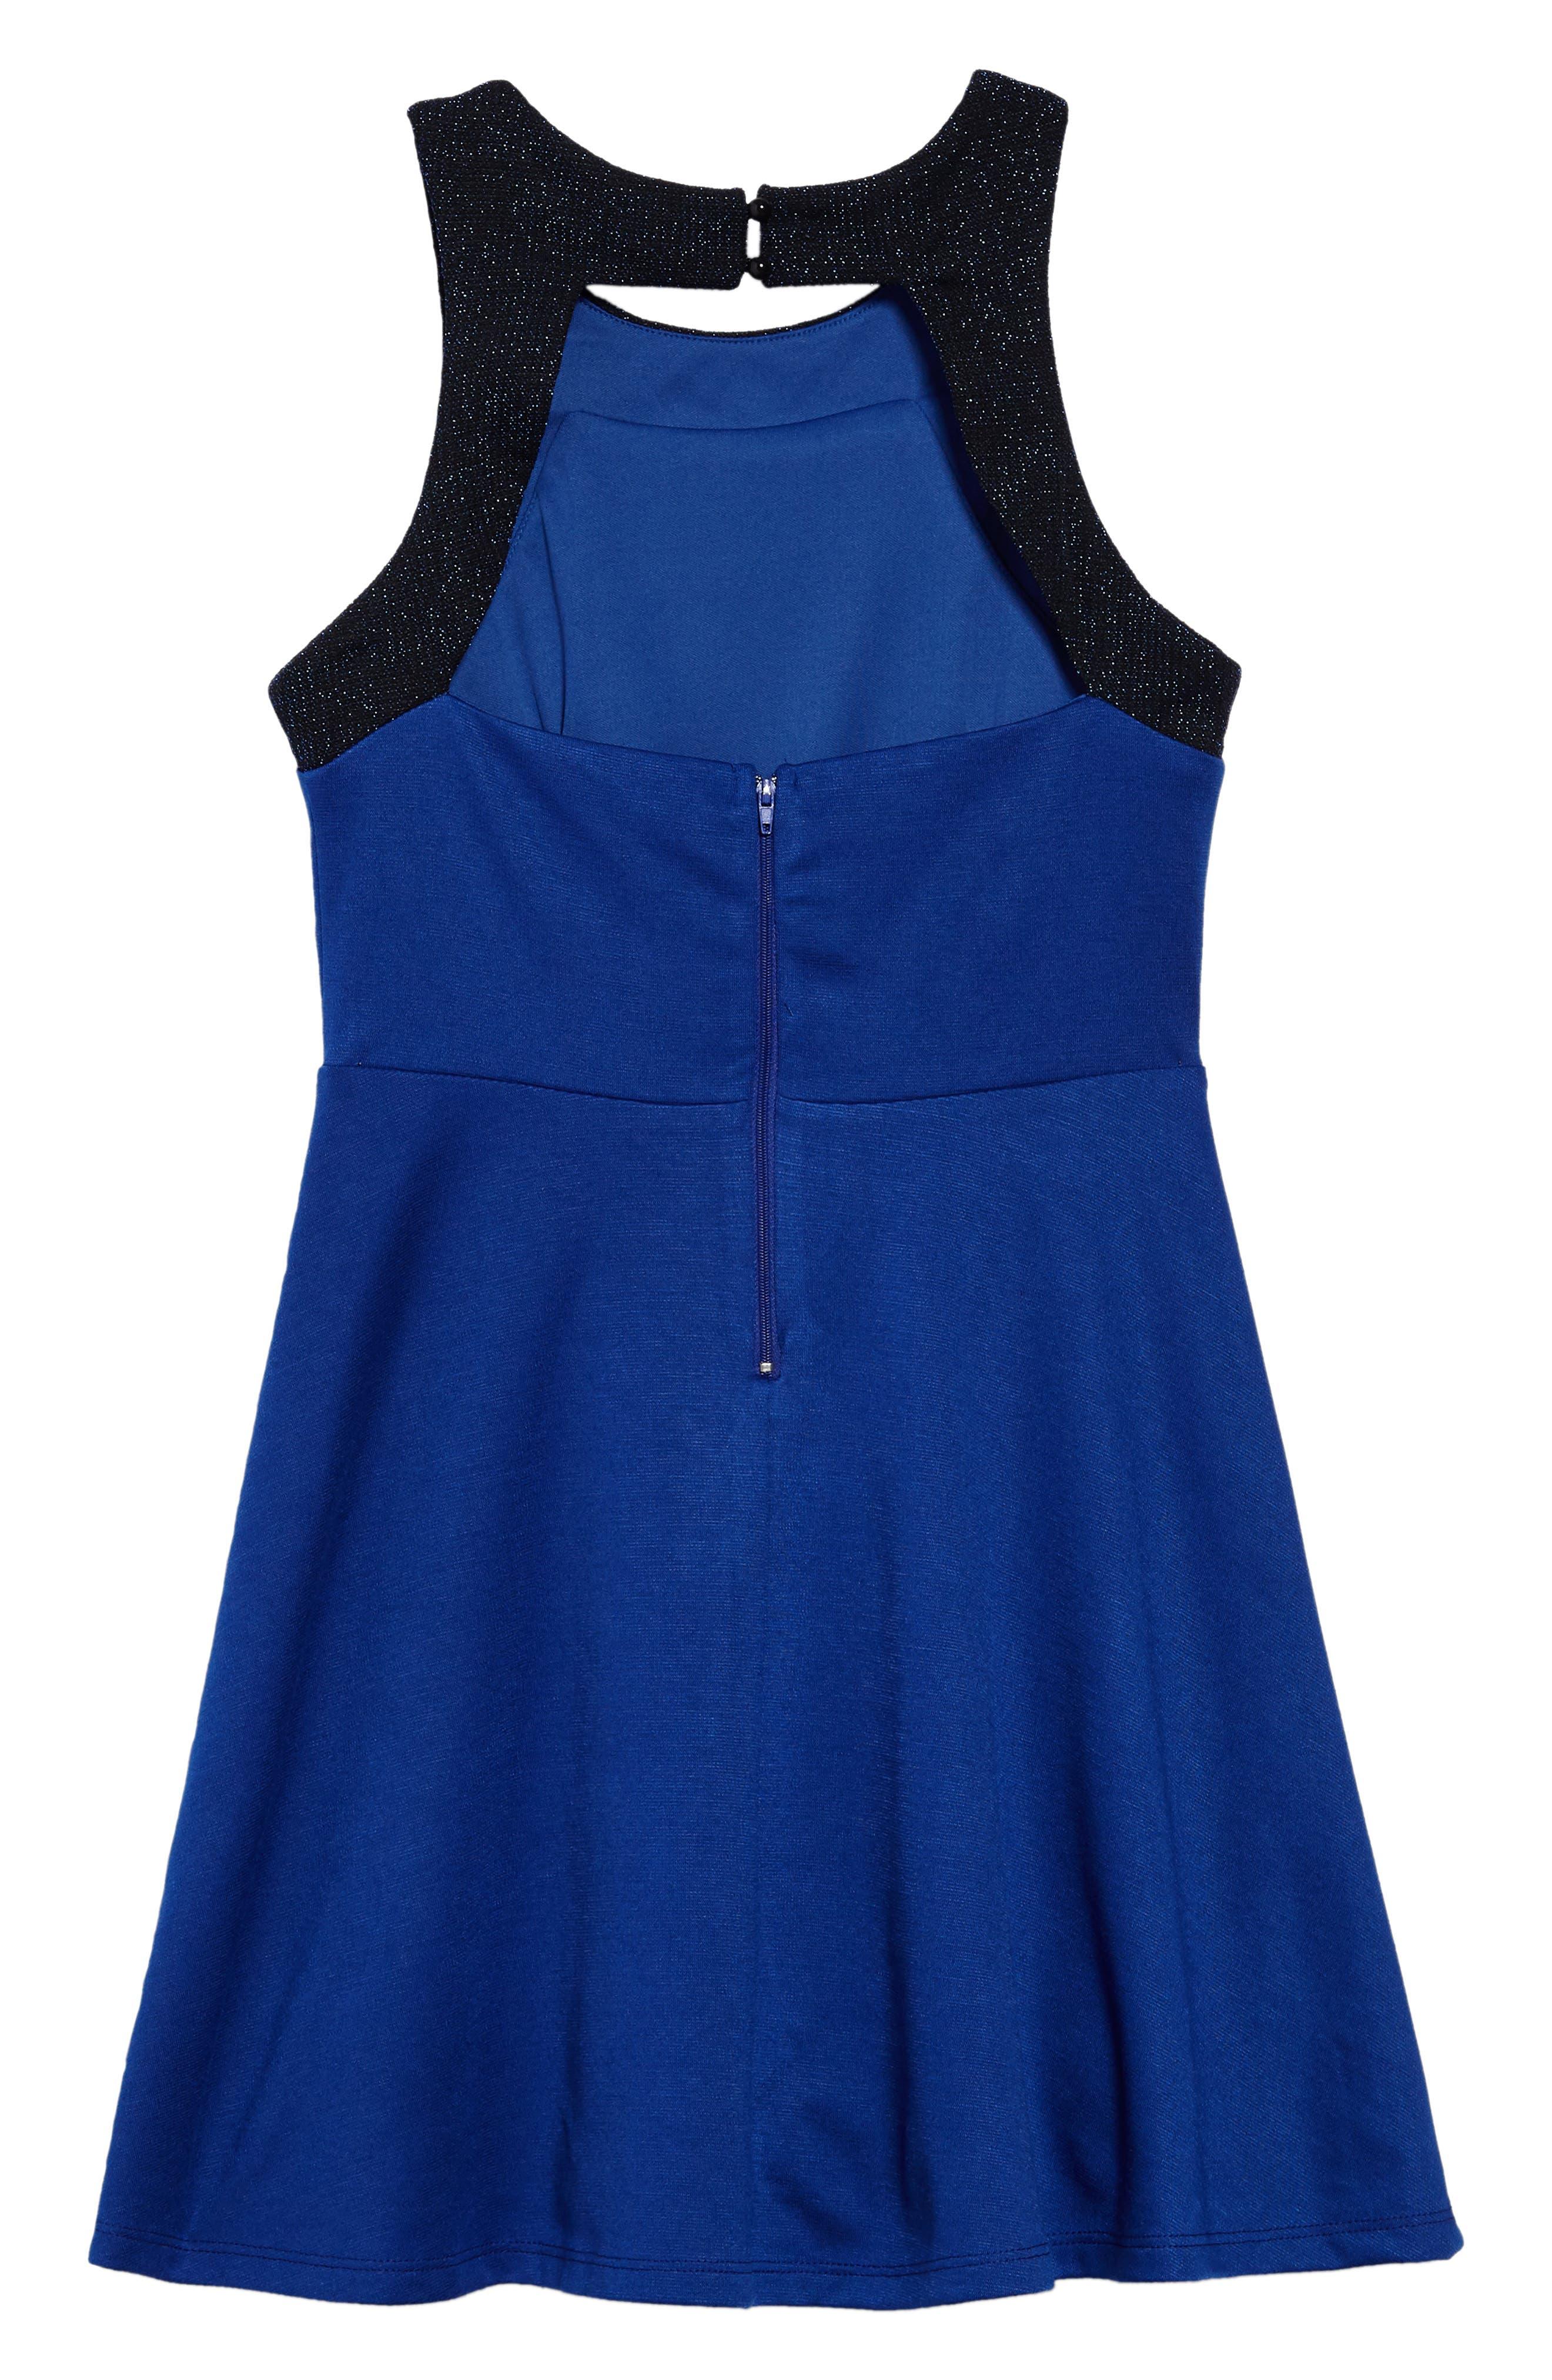 Heather Open Back Dress,                             Alternate thumbnail 2, color,                             420